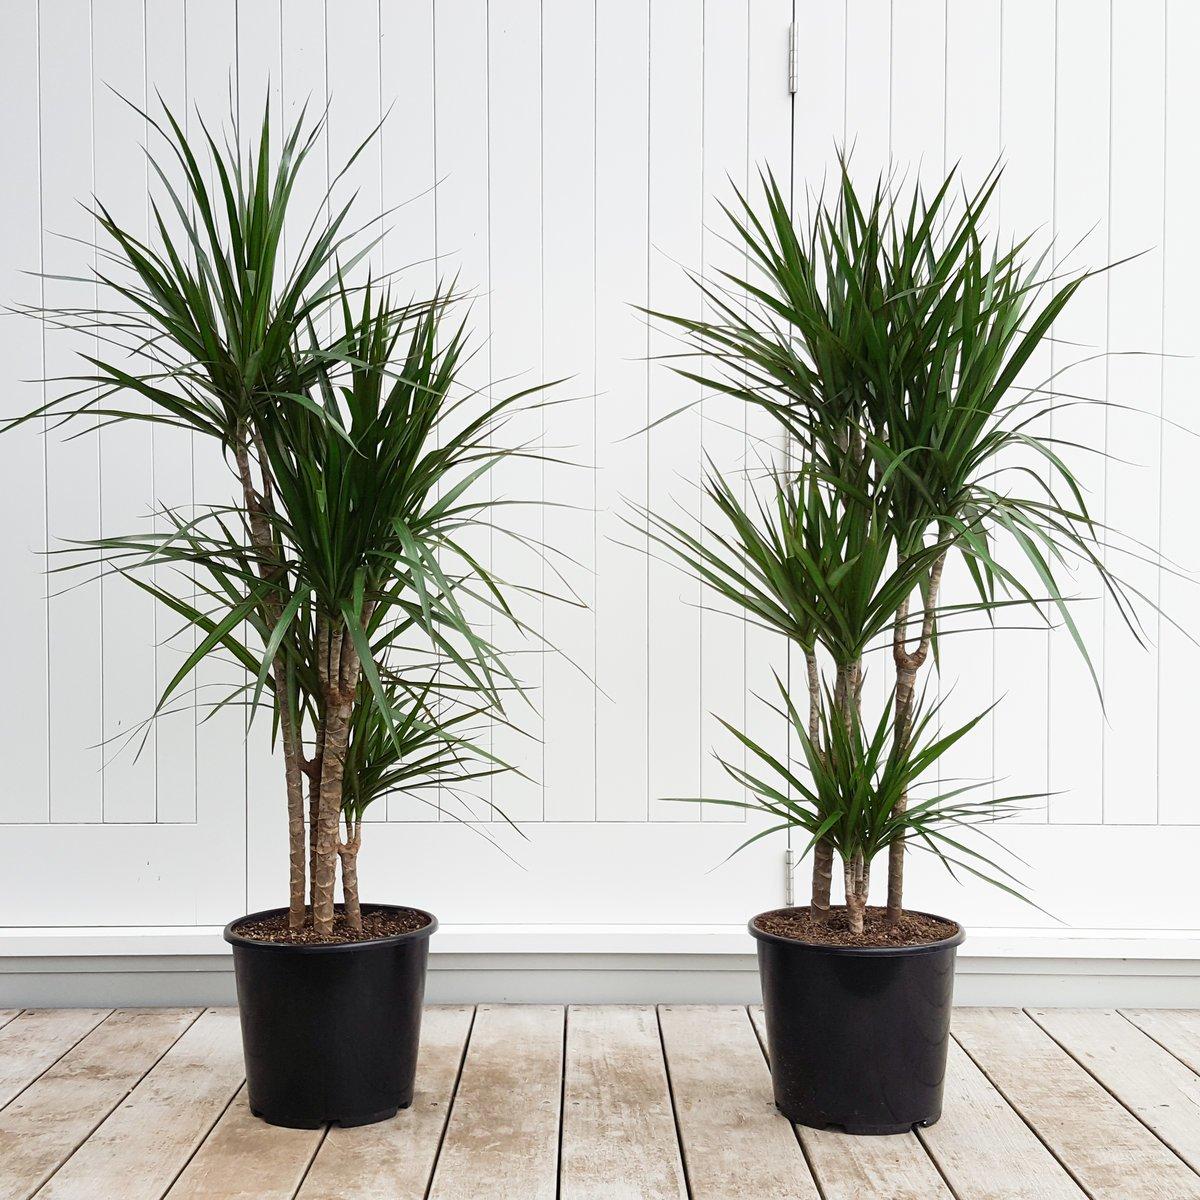 Dracaena Marginata Tall Indoor Plant